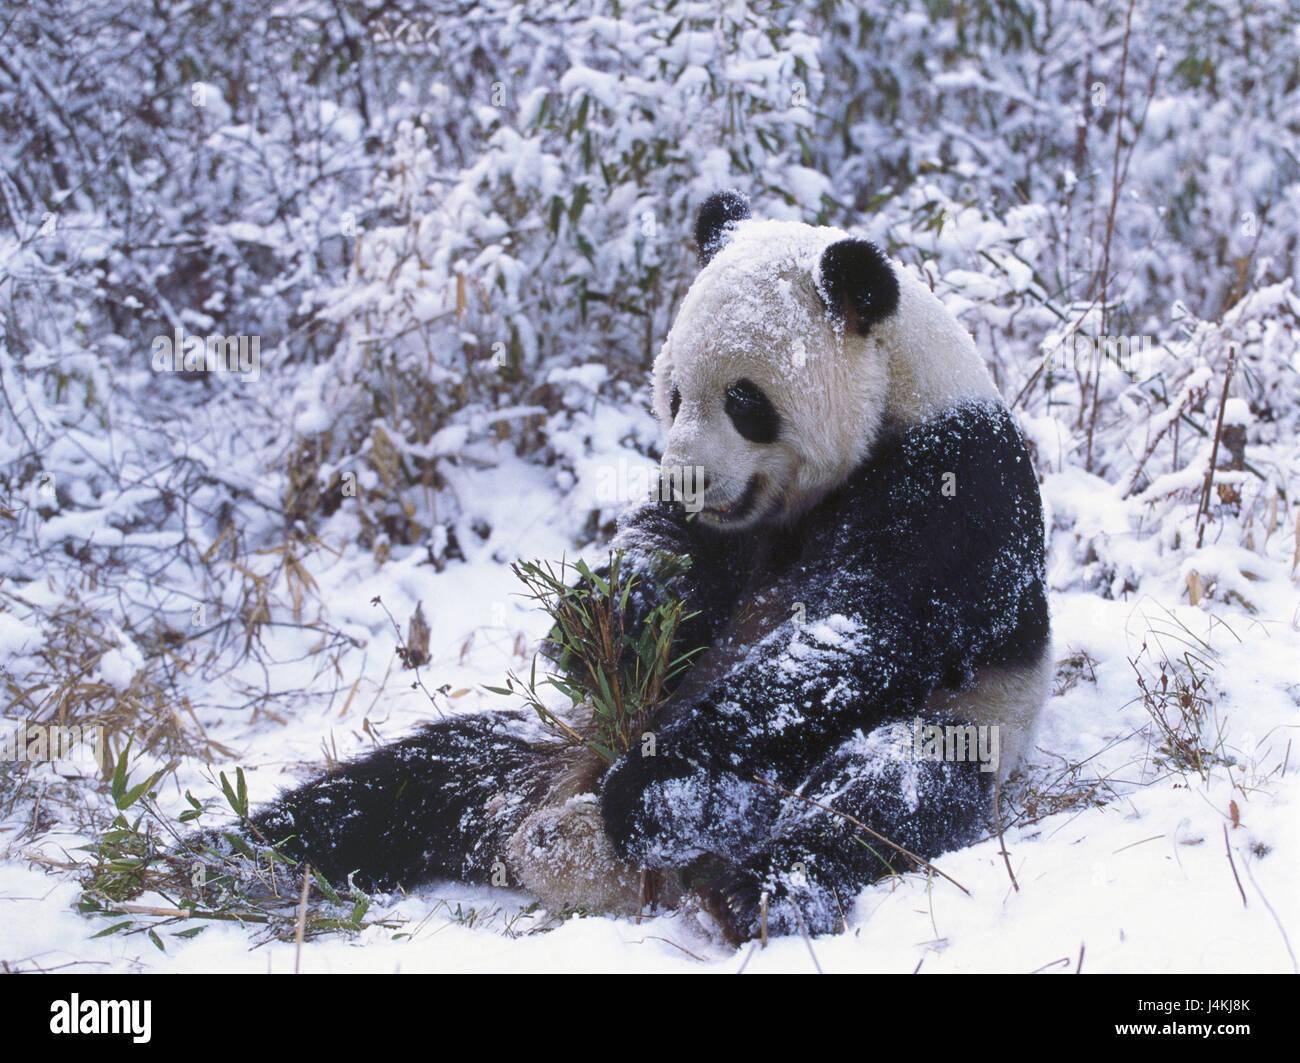 Madera, big panda, Ailuropoda melanoleuca, sentarse, bambú, ingestión, invierno mundo animal, naturaleza, Imagen De Stock